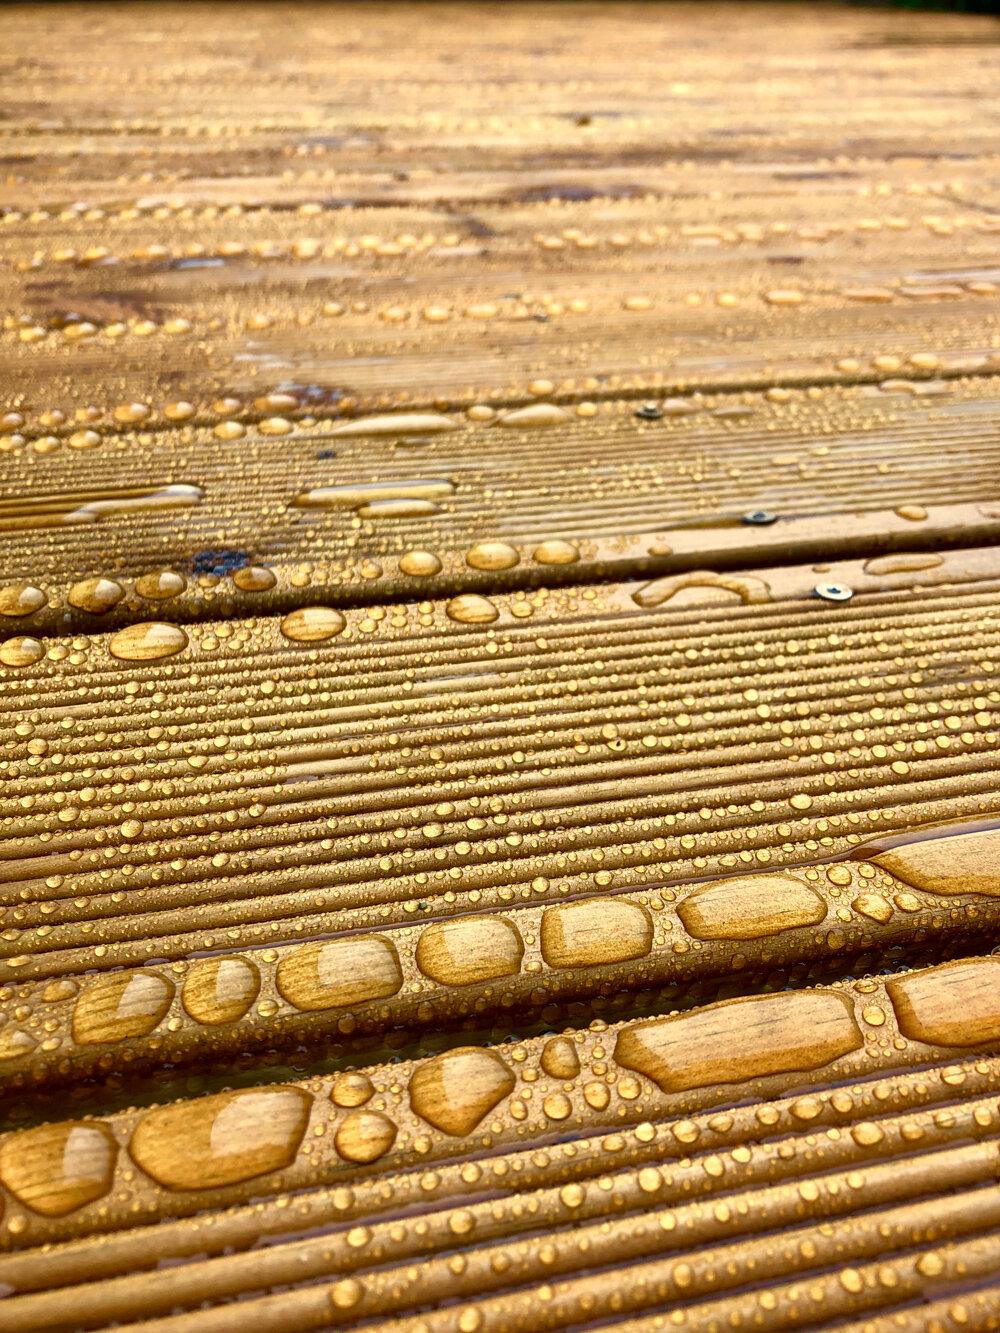 Buckskin on softwood decking